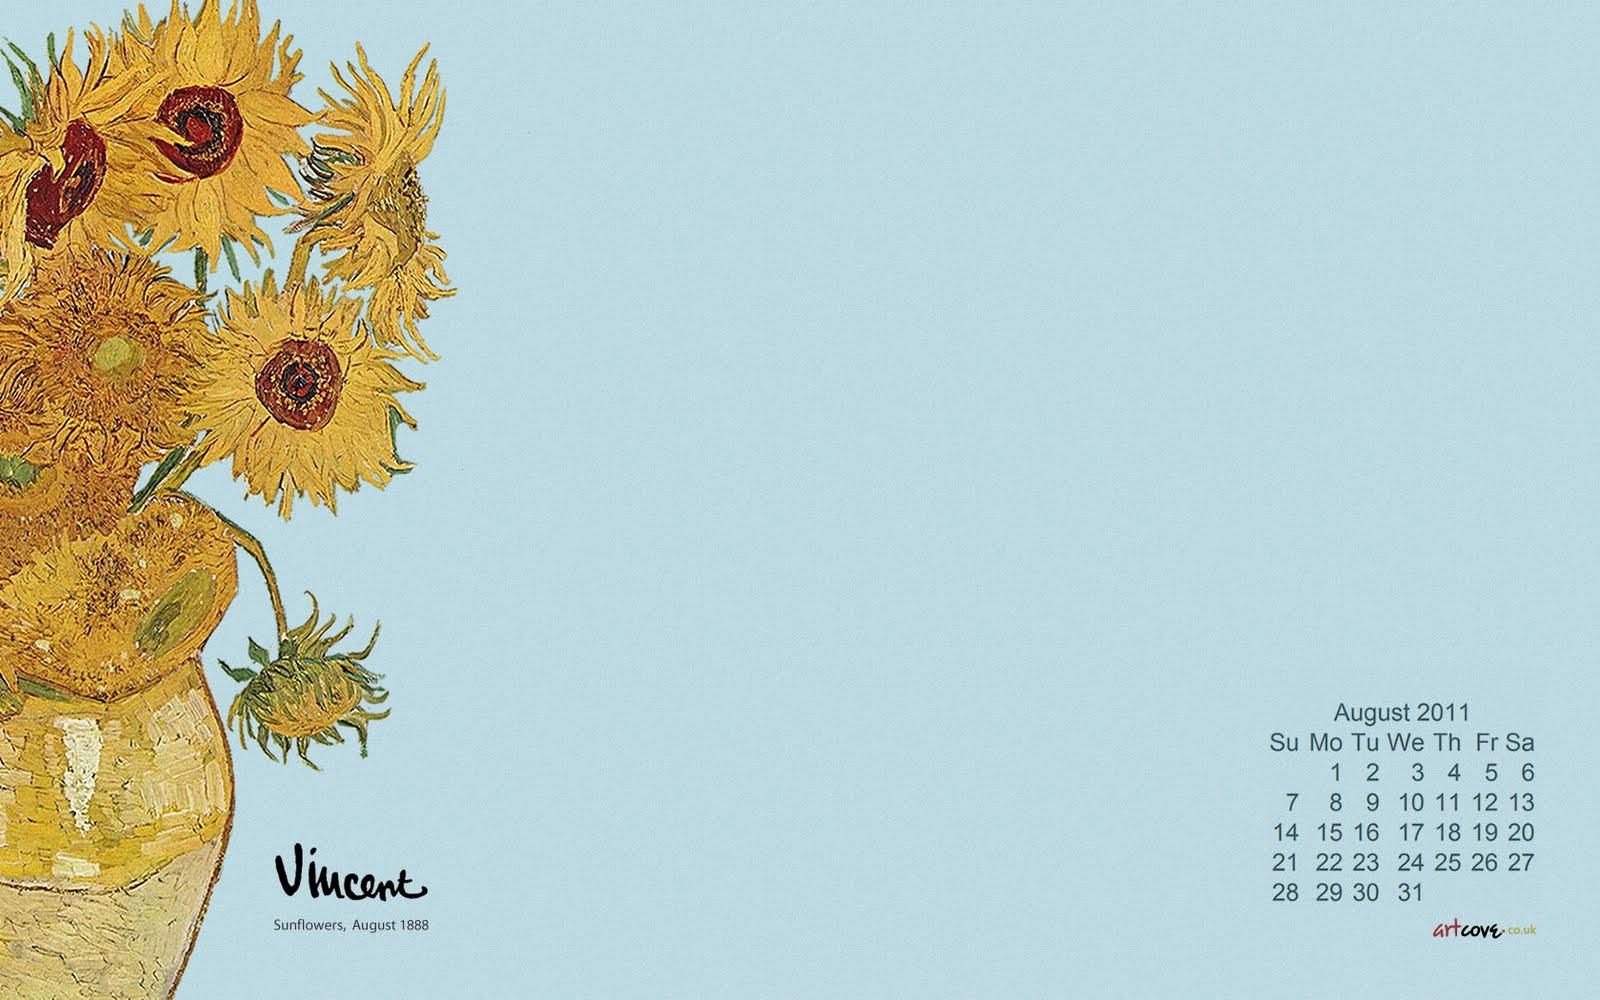 http://3.bp.blogspot.com/-FXoZYojVVt8/TjgclbkZNxI/AAAAAAAADzY/KE8_YlXOt5w/s1600/Sunflowers-Van-Gogh1680x1050.jpg